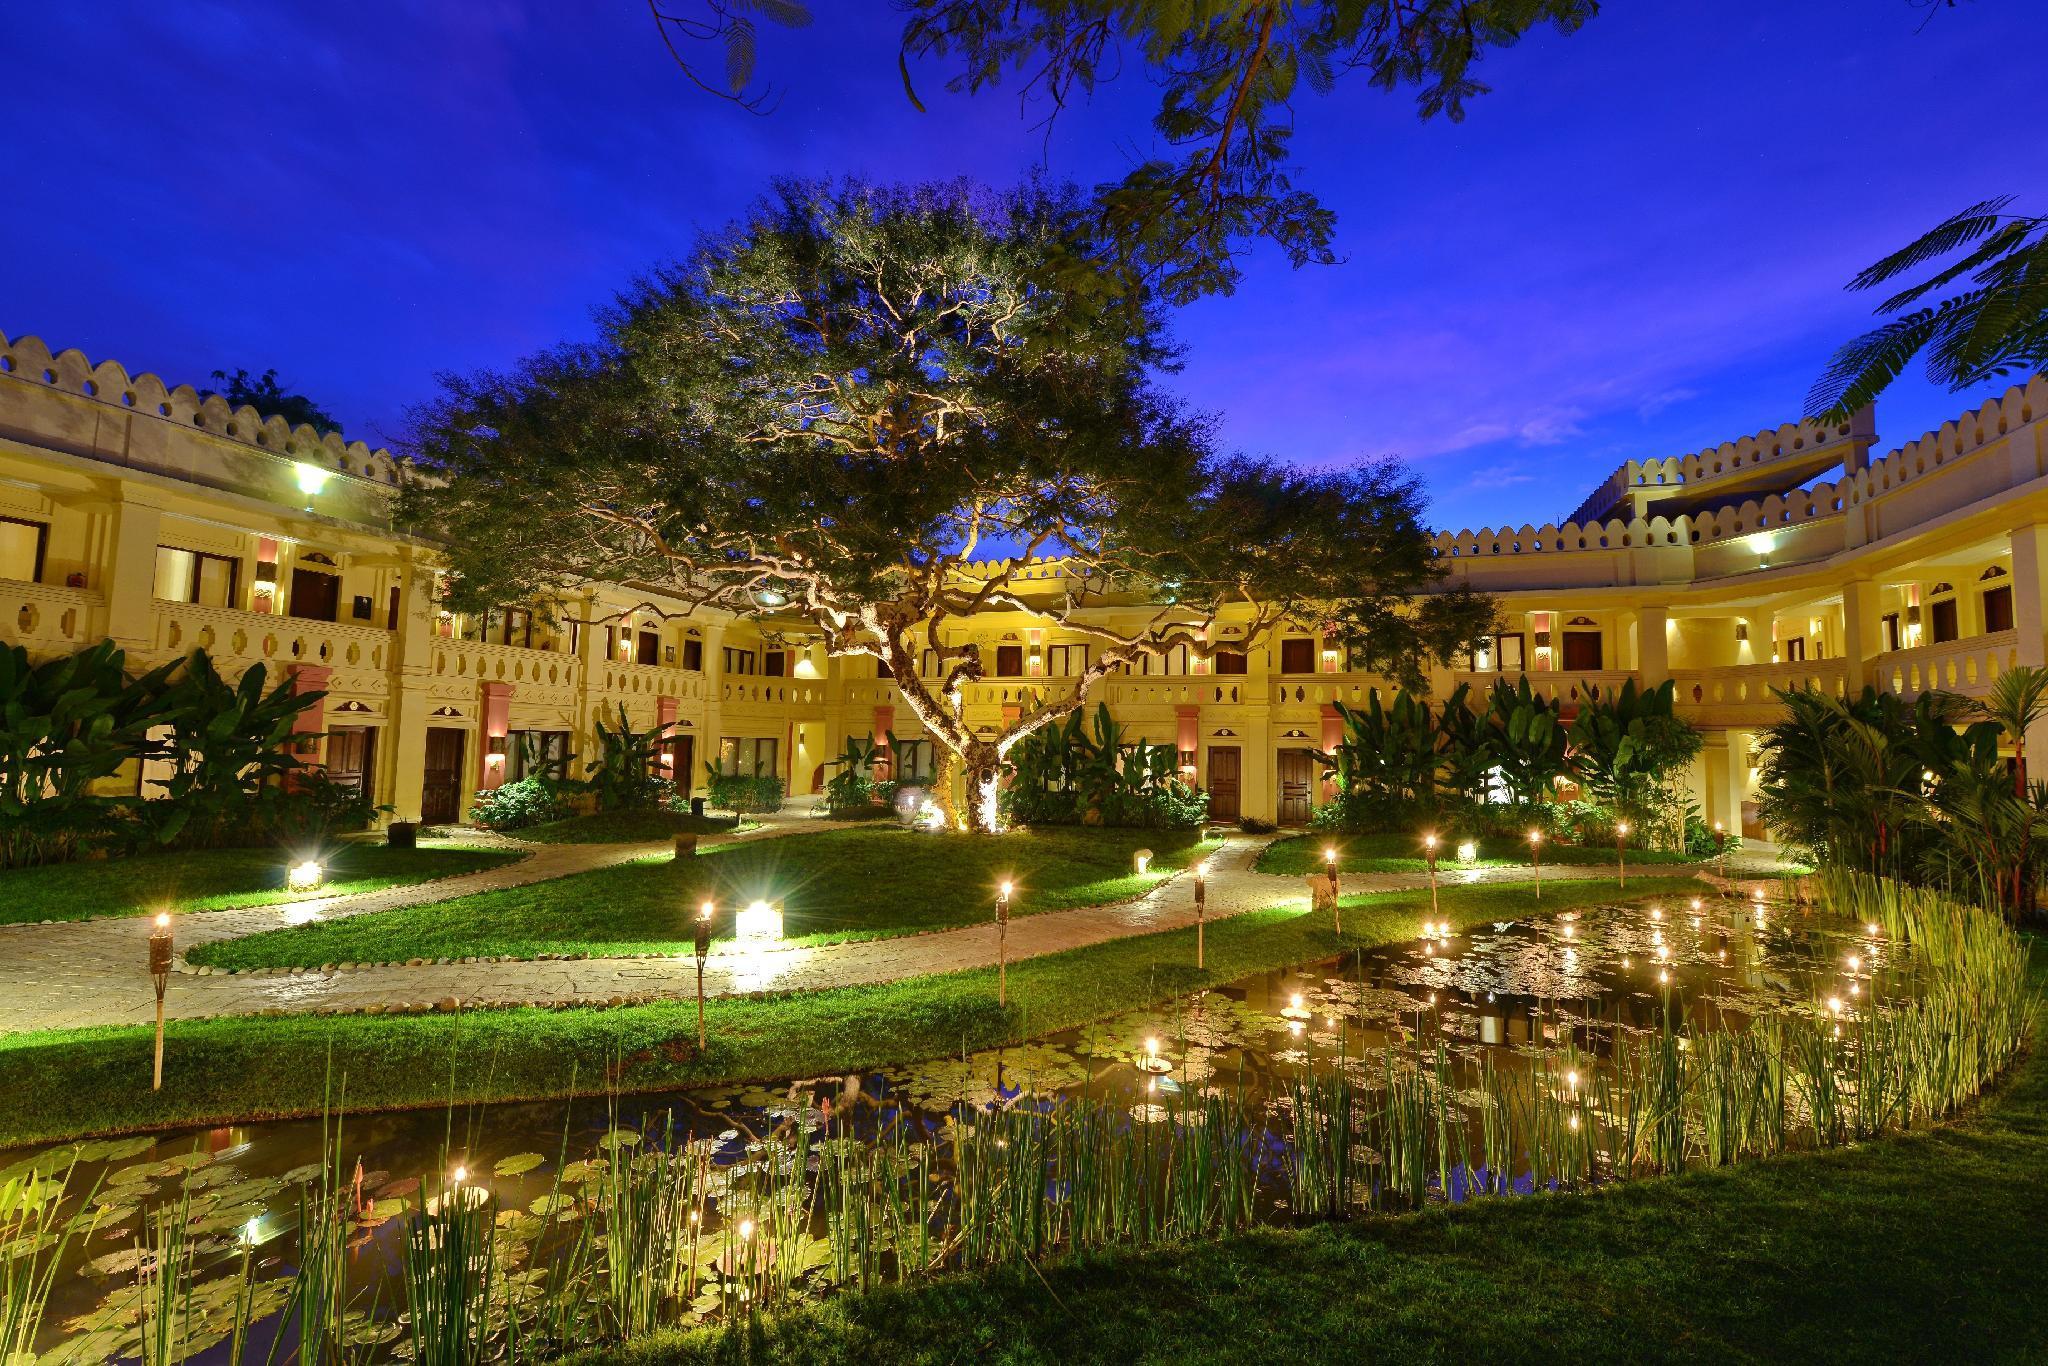 Areindmar Hotel